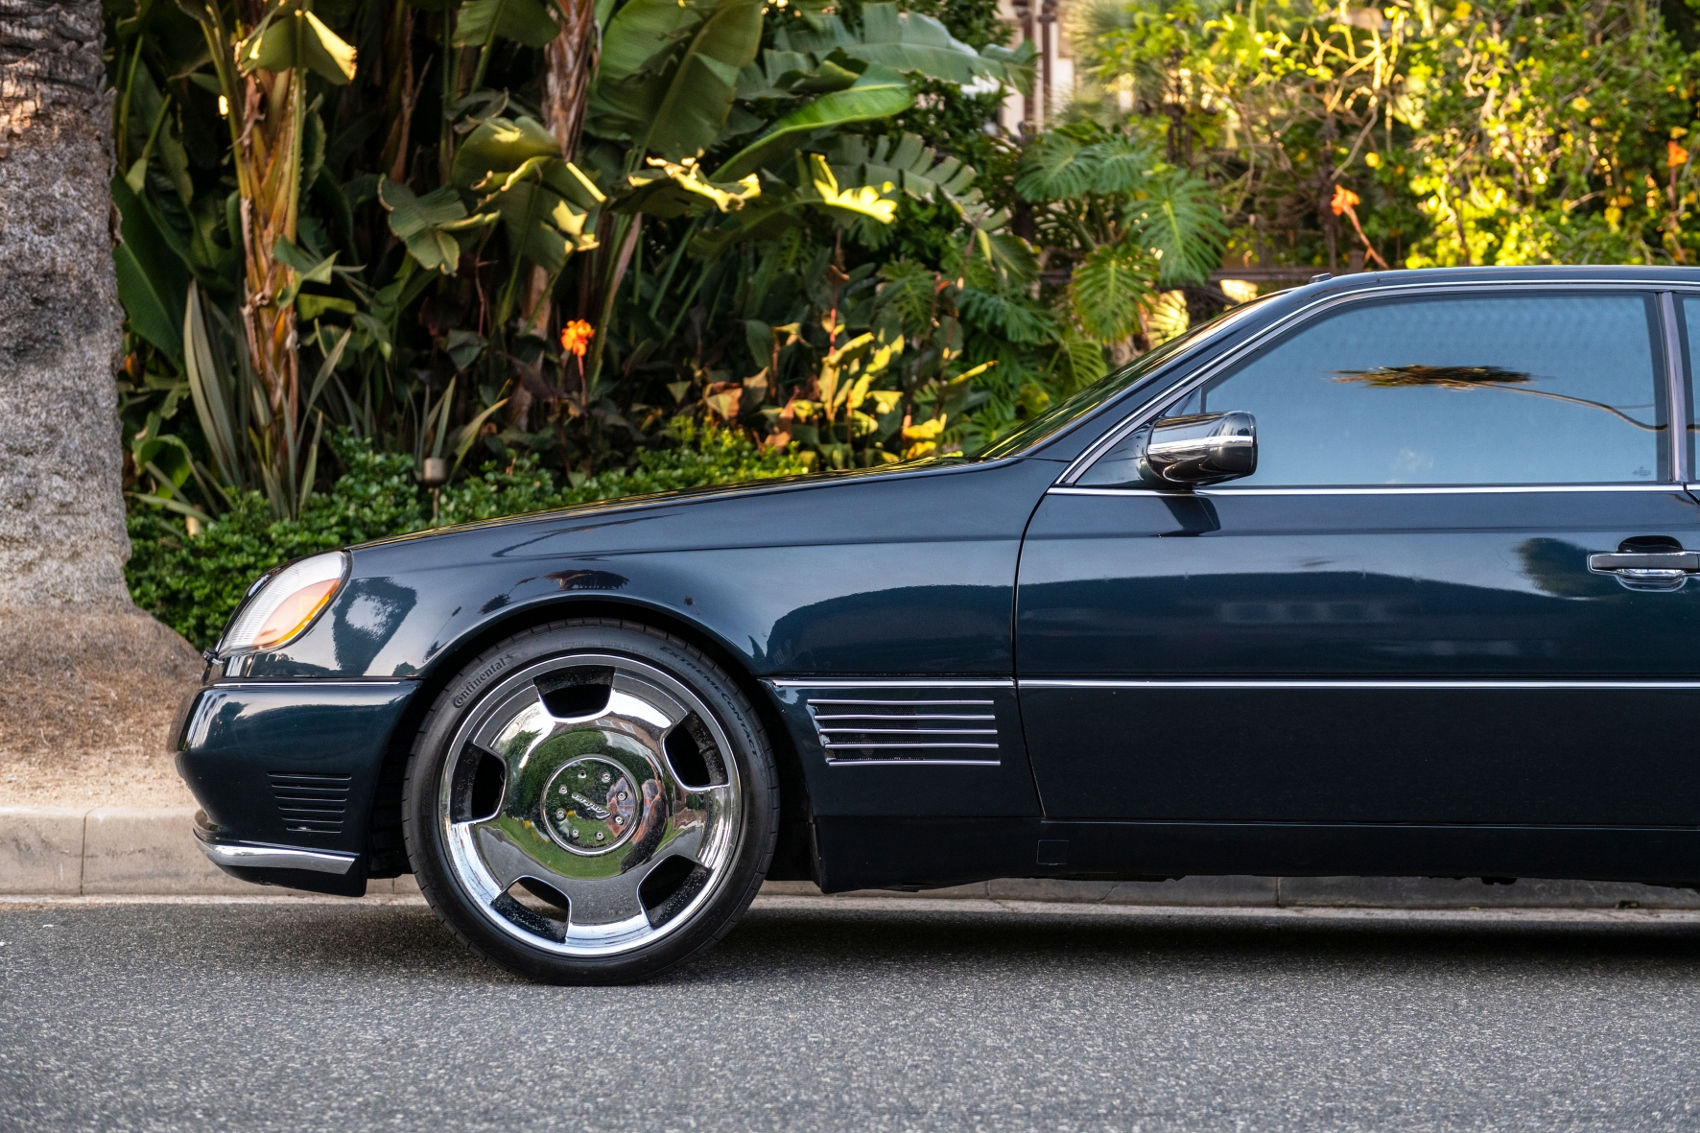 Pozrite si Mercedes S600 Michaela Jordana z roku 1996 6Yrc1nuAaD lorinsercl600ex-jordansidedetailfro